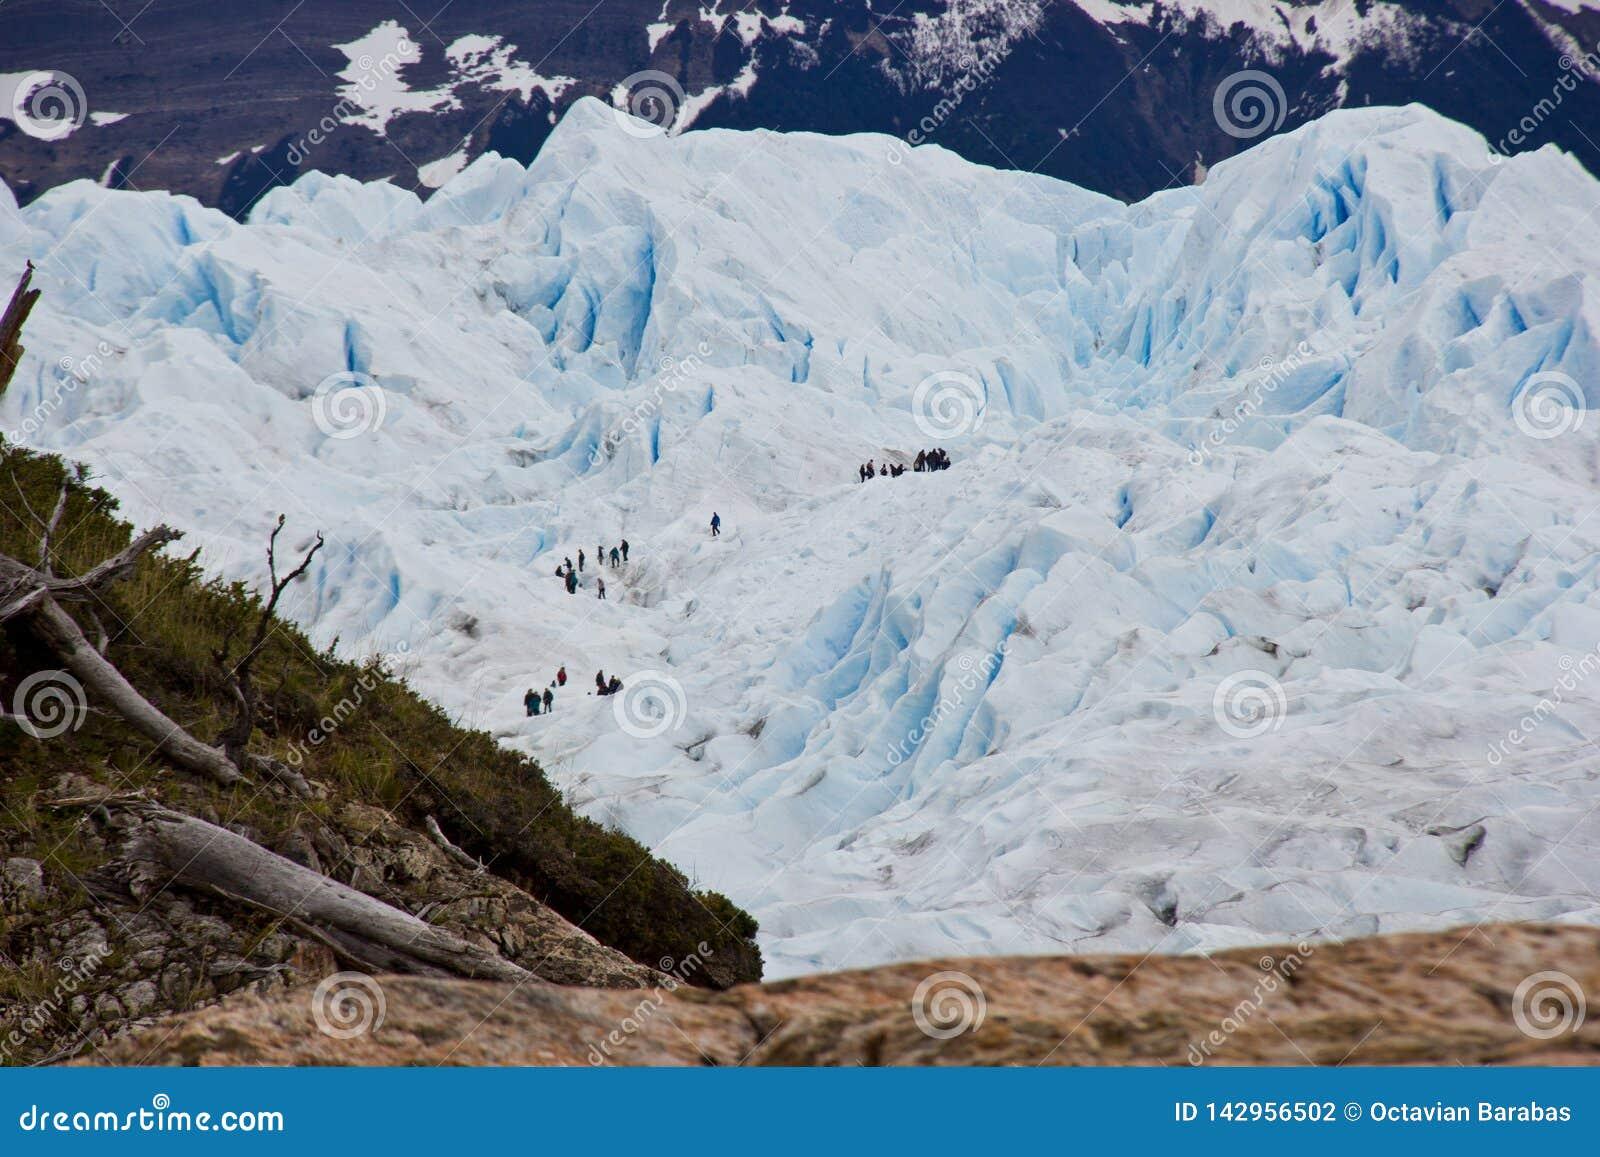 Toeristen die gletsjer in Chili/Zuid-Amerika beklimmen